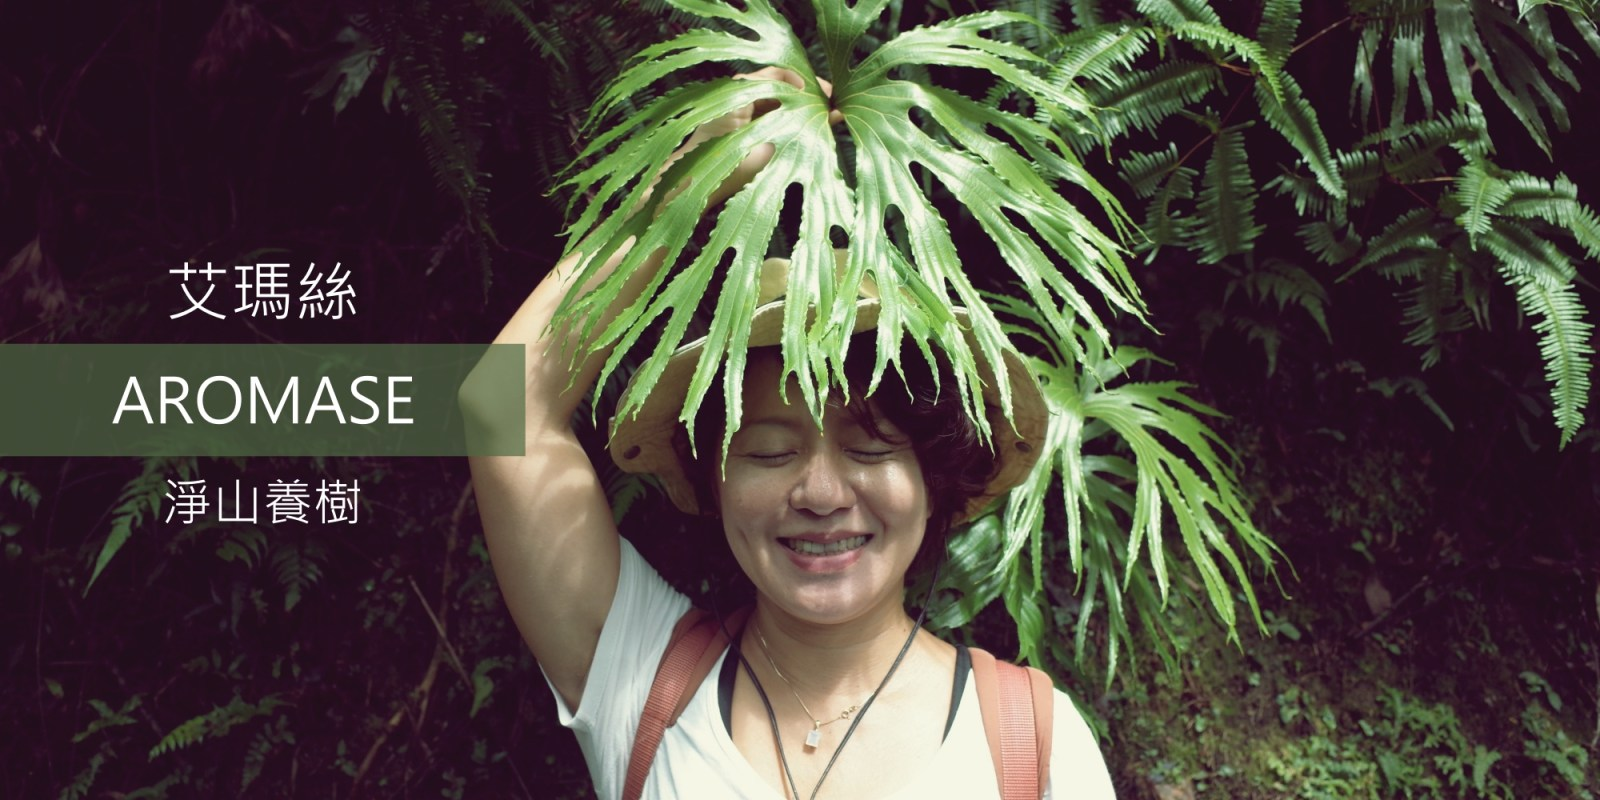 AROMASE 艾瑪絲 淨山養樹。從日常生活的每一天,找到土地最初的美好